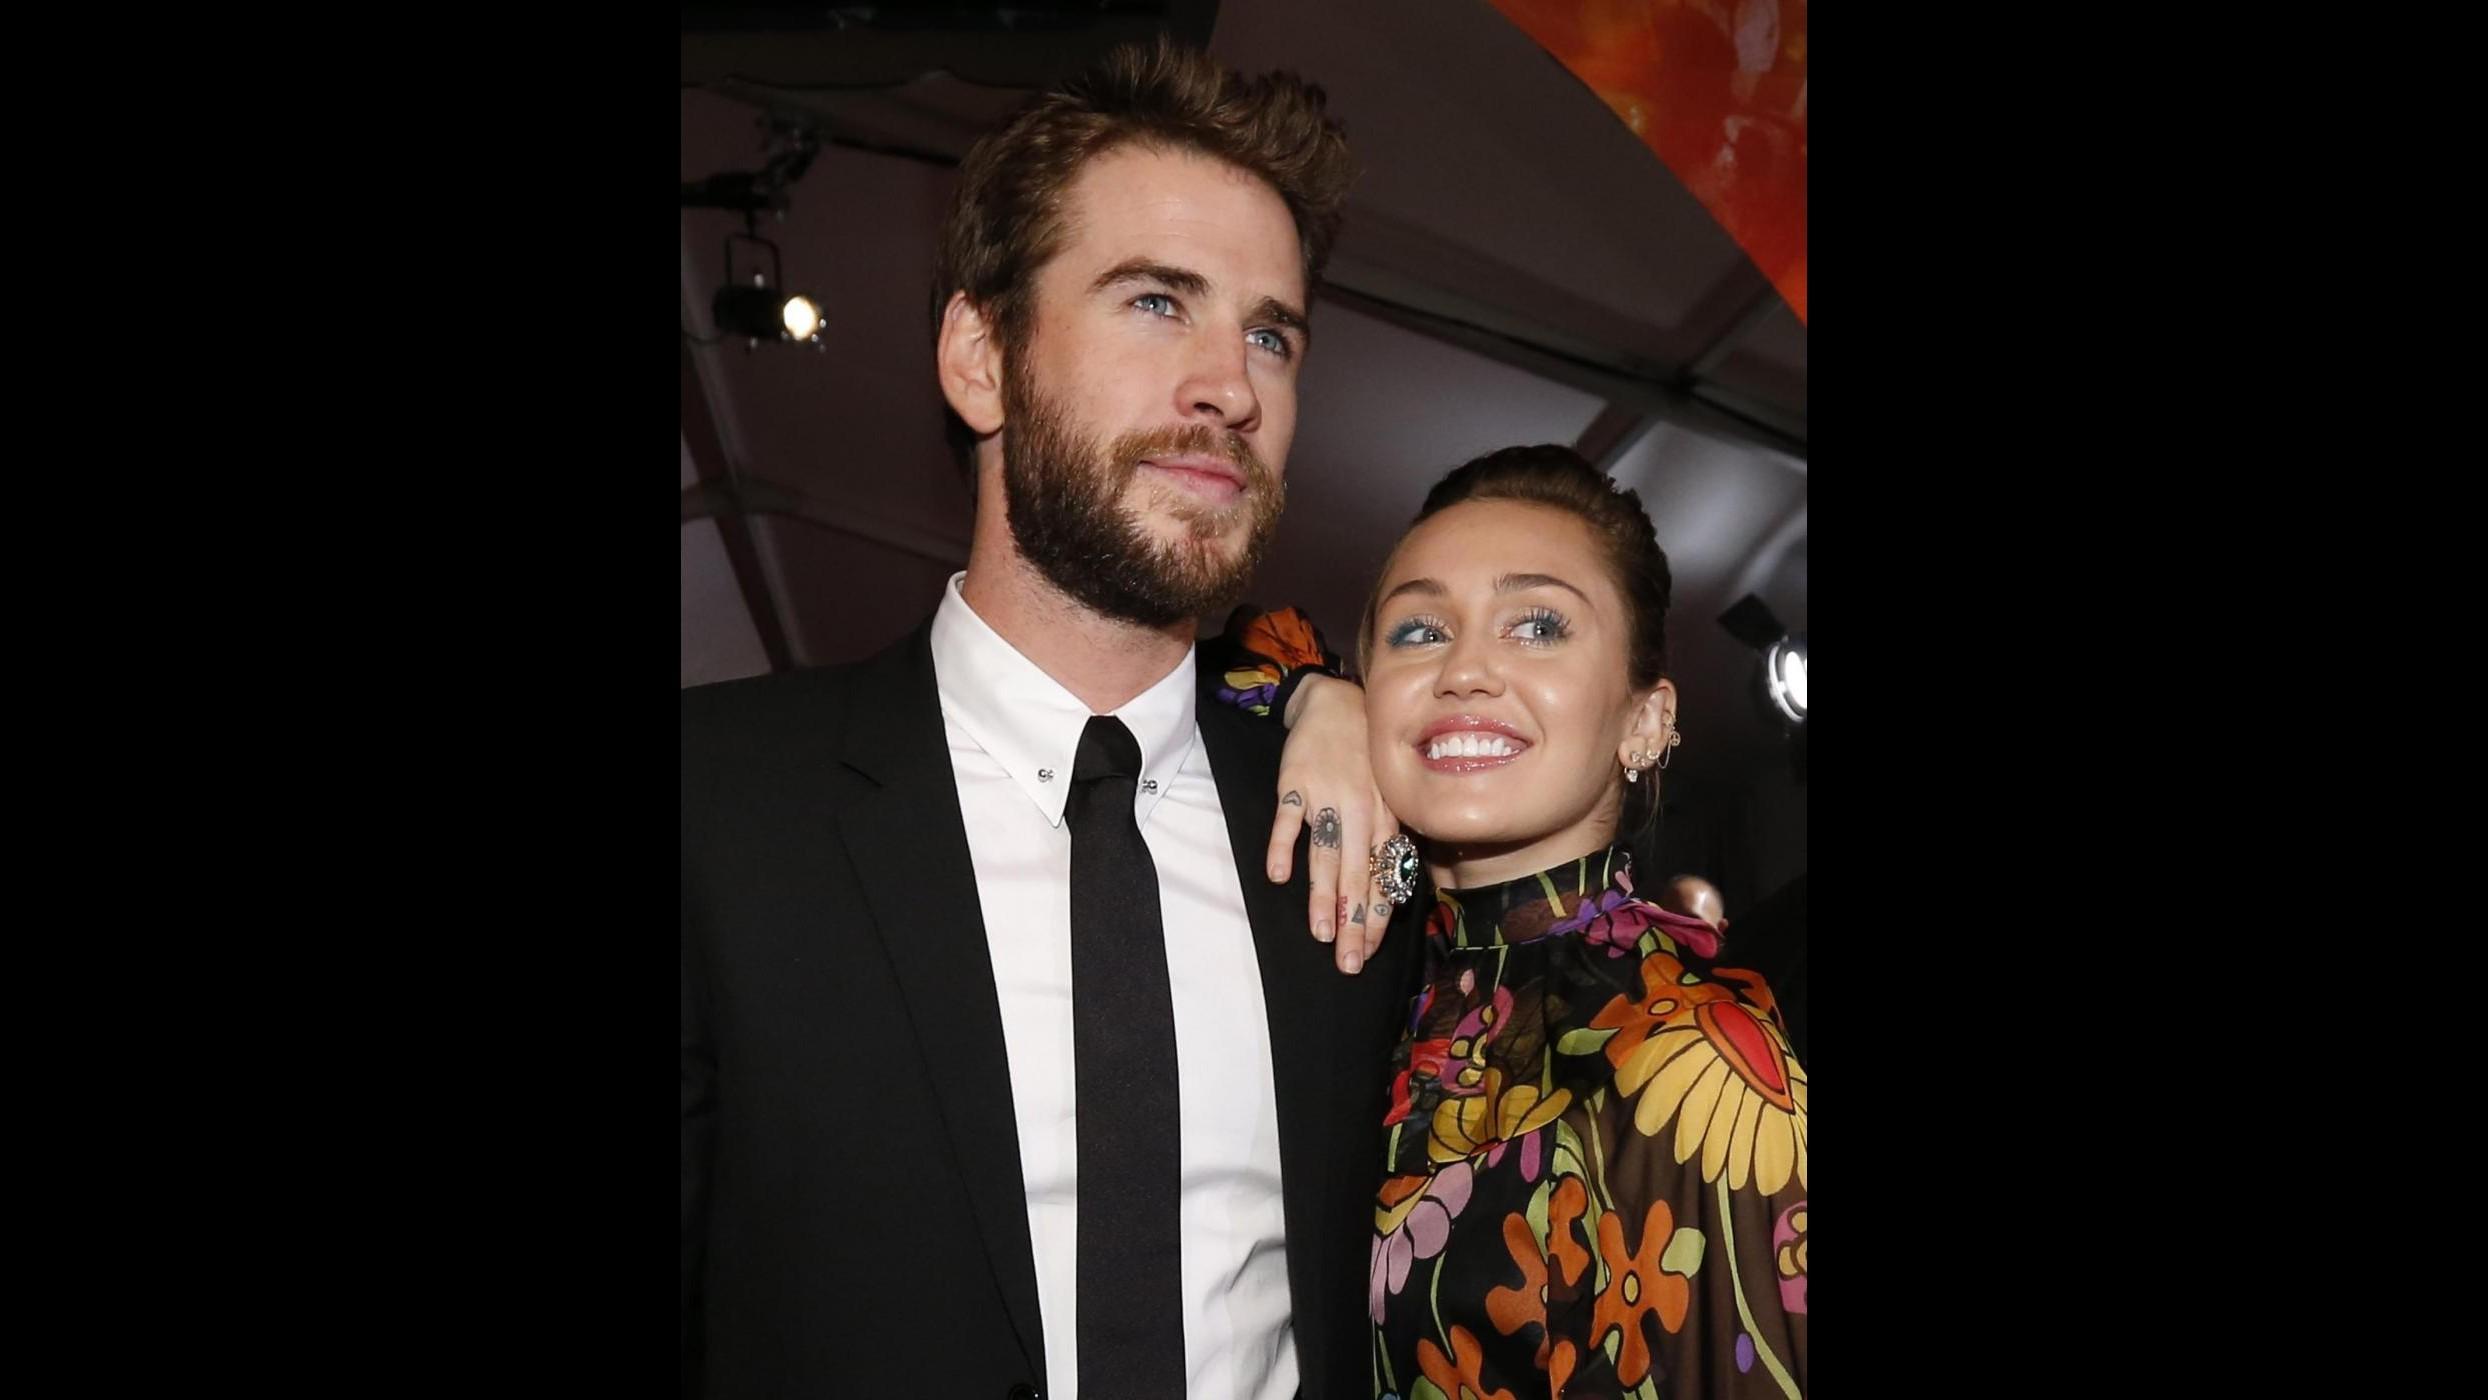 Dai fratelli Hemsworth a Cate Blanchett, tutte le star sul red carpet di Thor Ragnarok